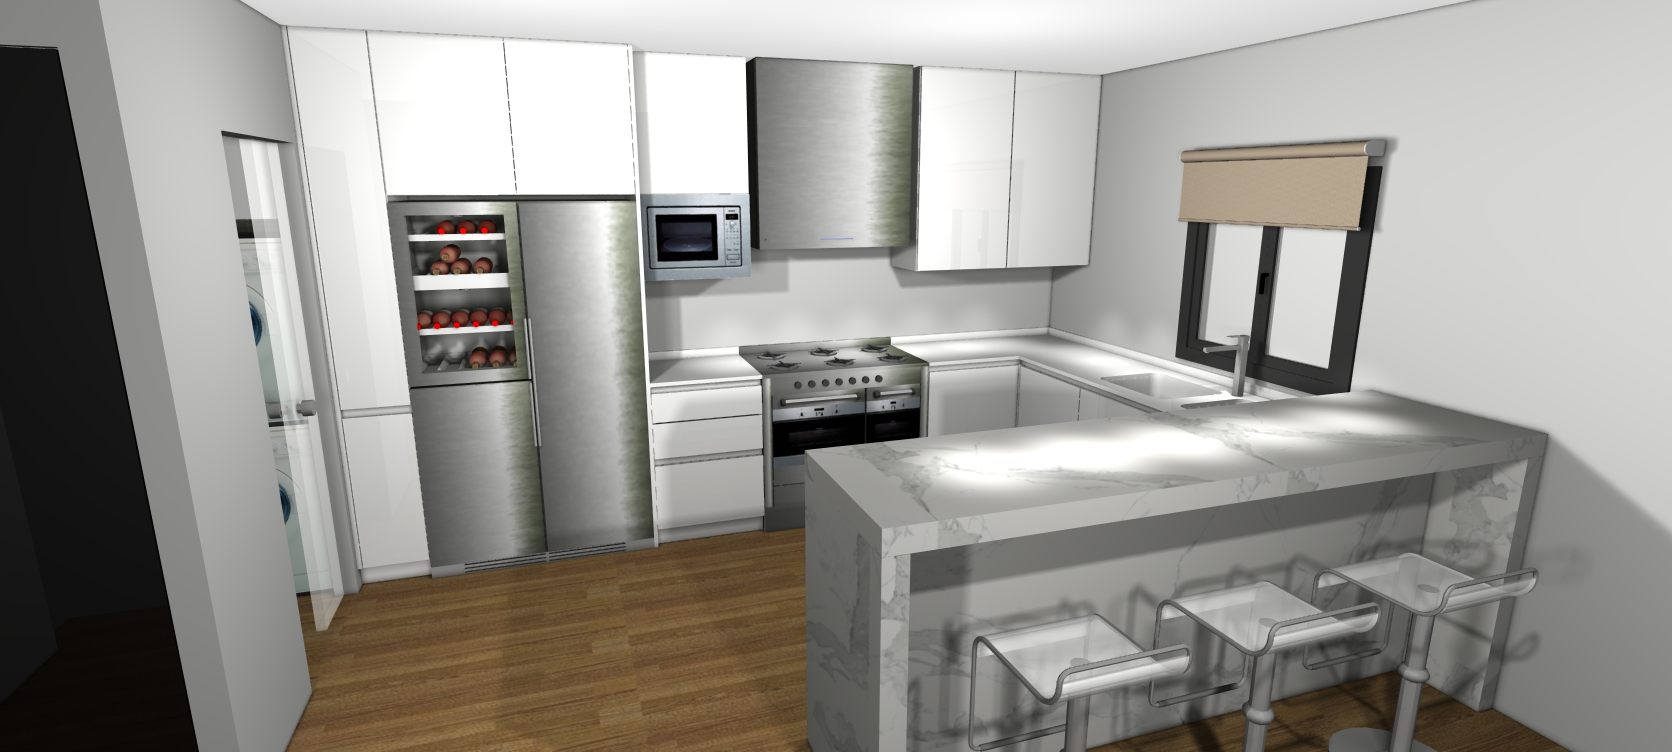 Emmme studio cocinas rio - Emmme studio ...